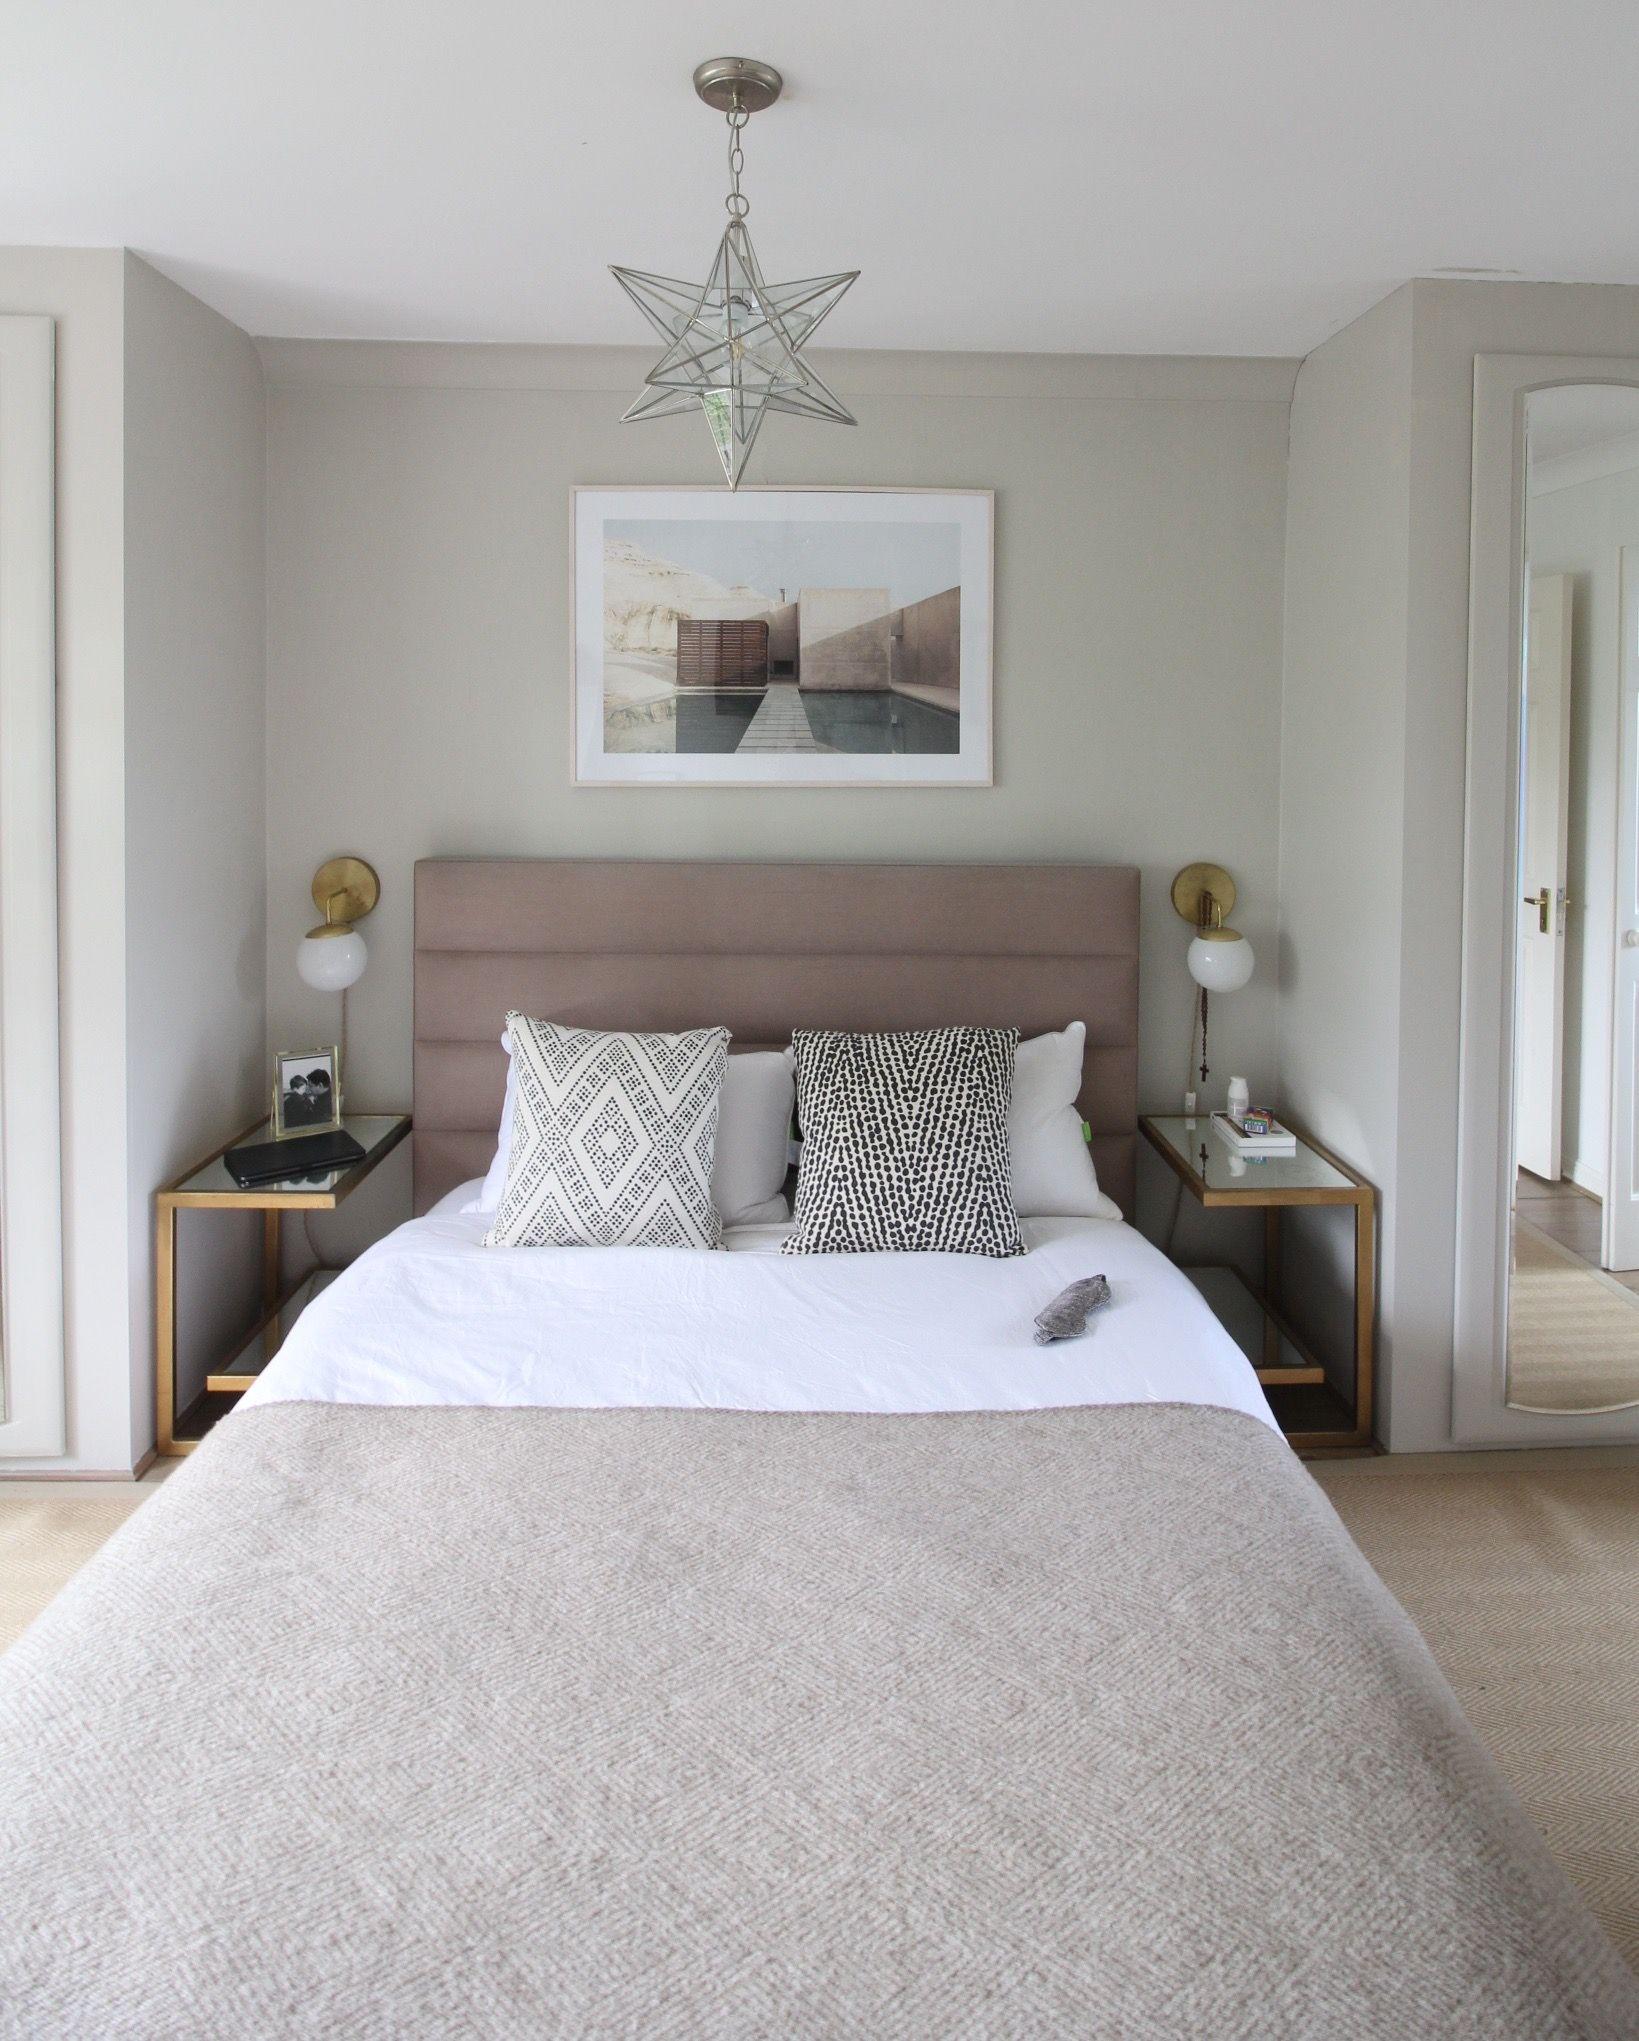 Minimalist neutral bedroom decor in 2020 | Neutral bedroom ... on Neutral Minimalist Bedroom Ideas  id=97178